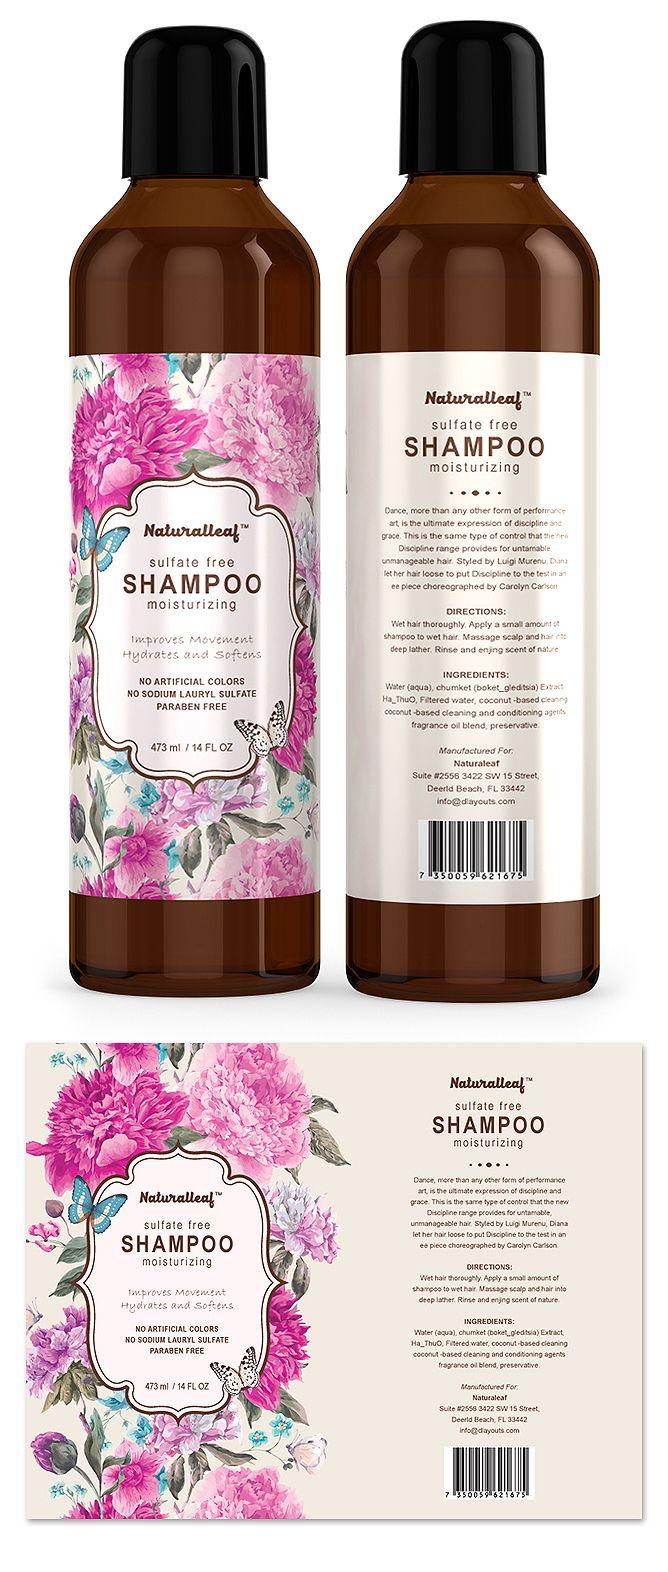 Hair Shampoo Label Template | Graphic Design Label ...